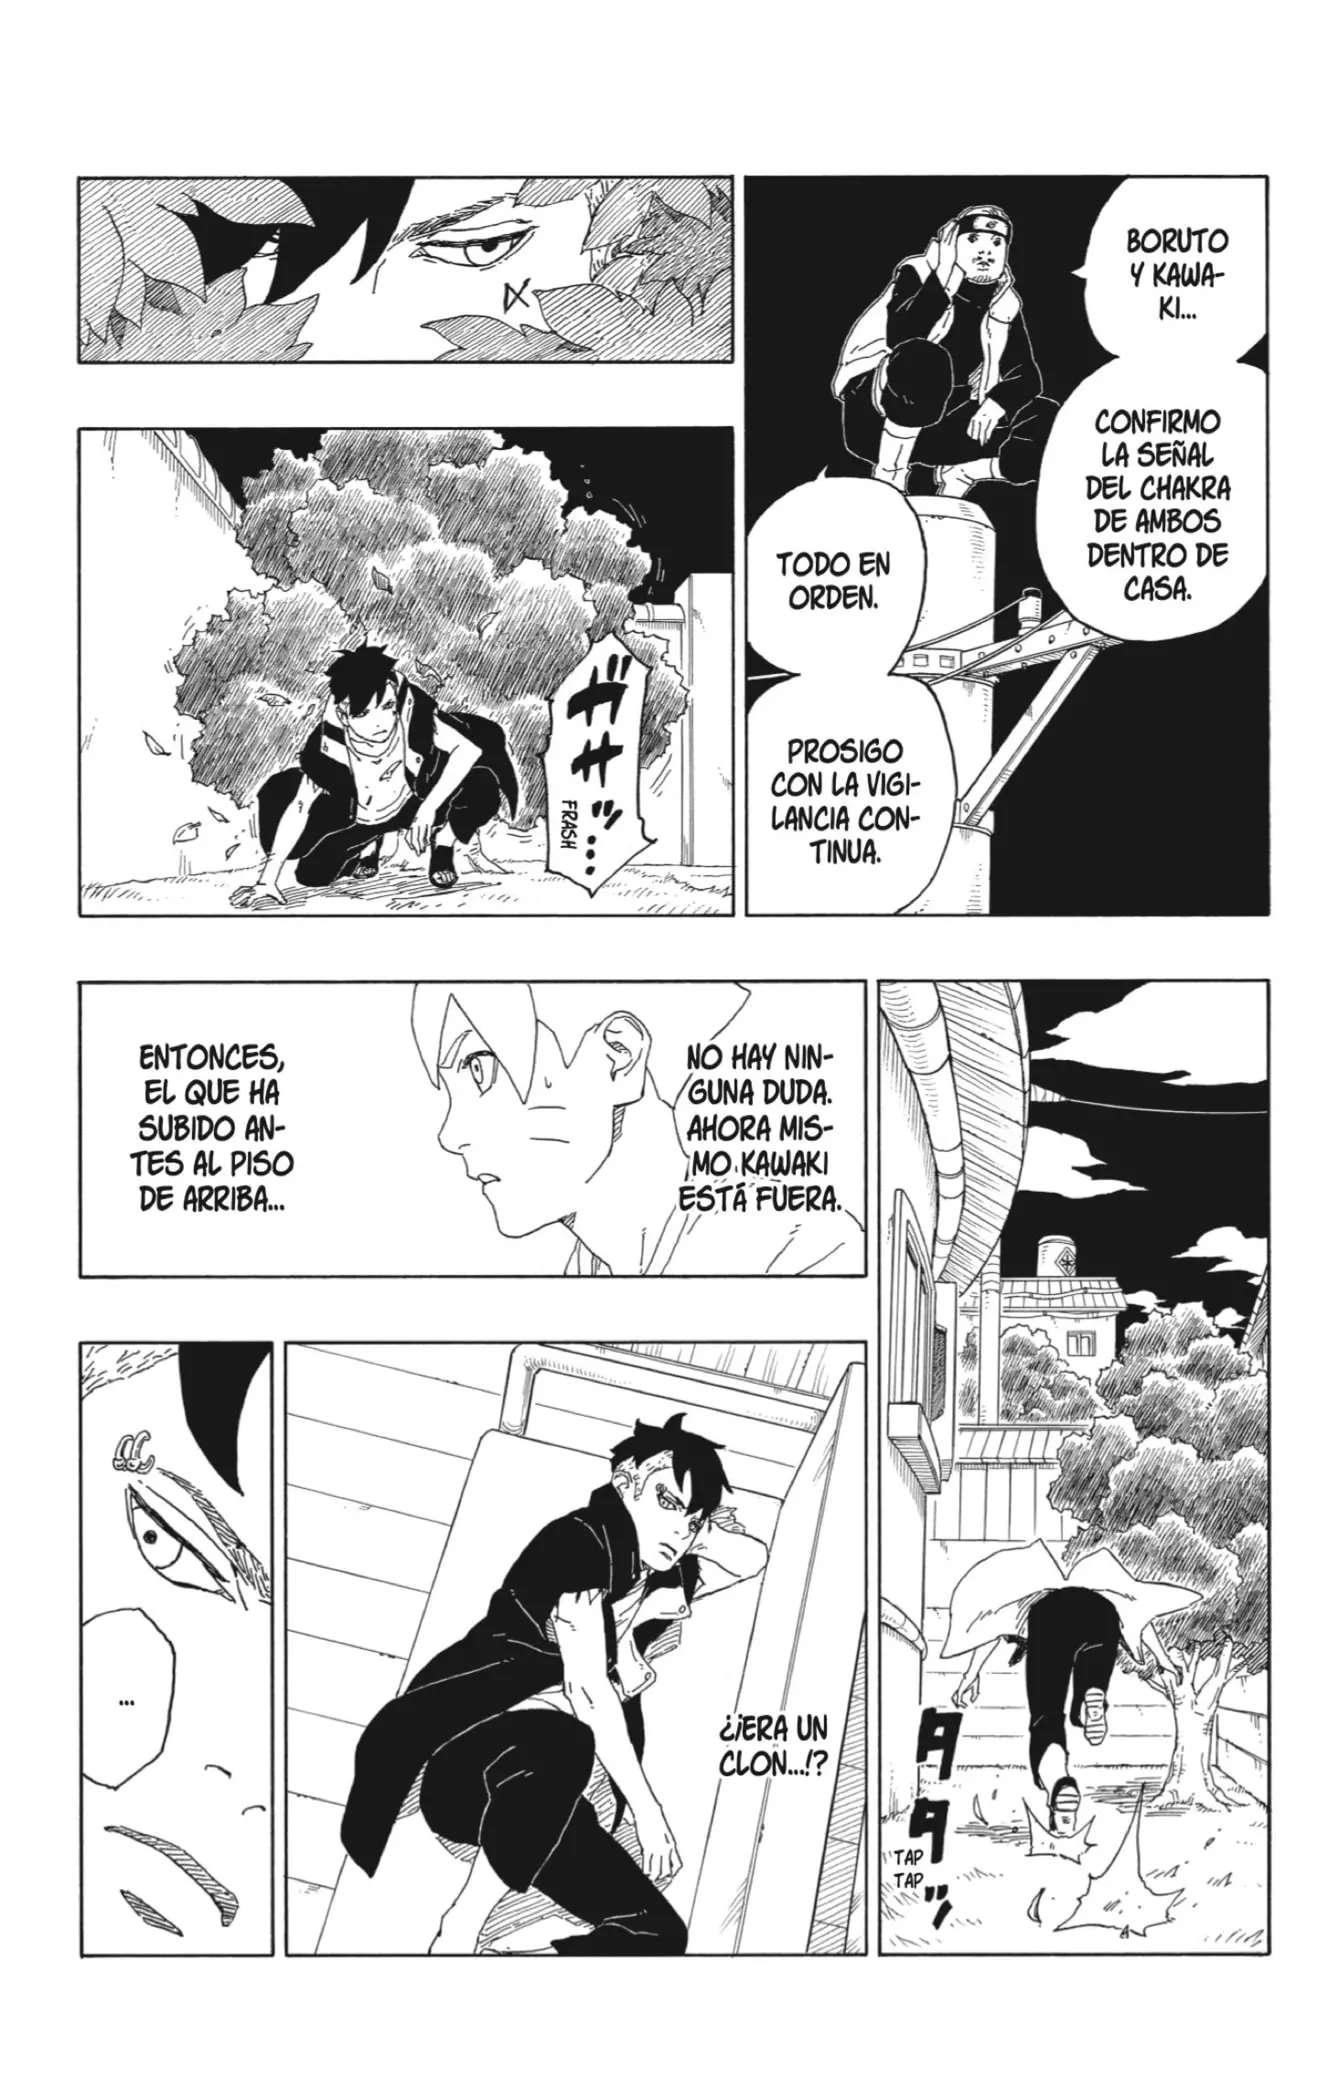 Boruto Manga Capitulo 61, image №28